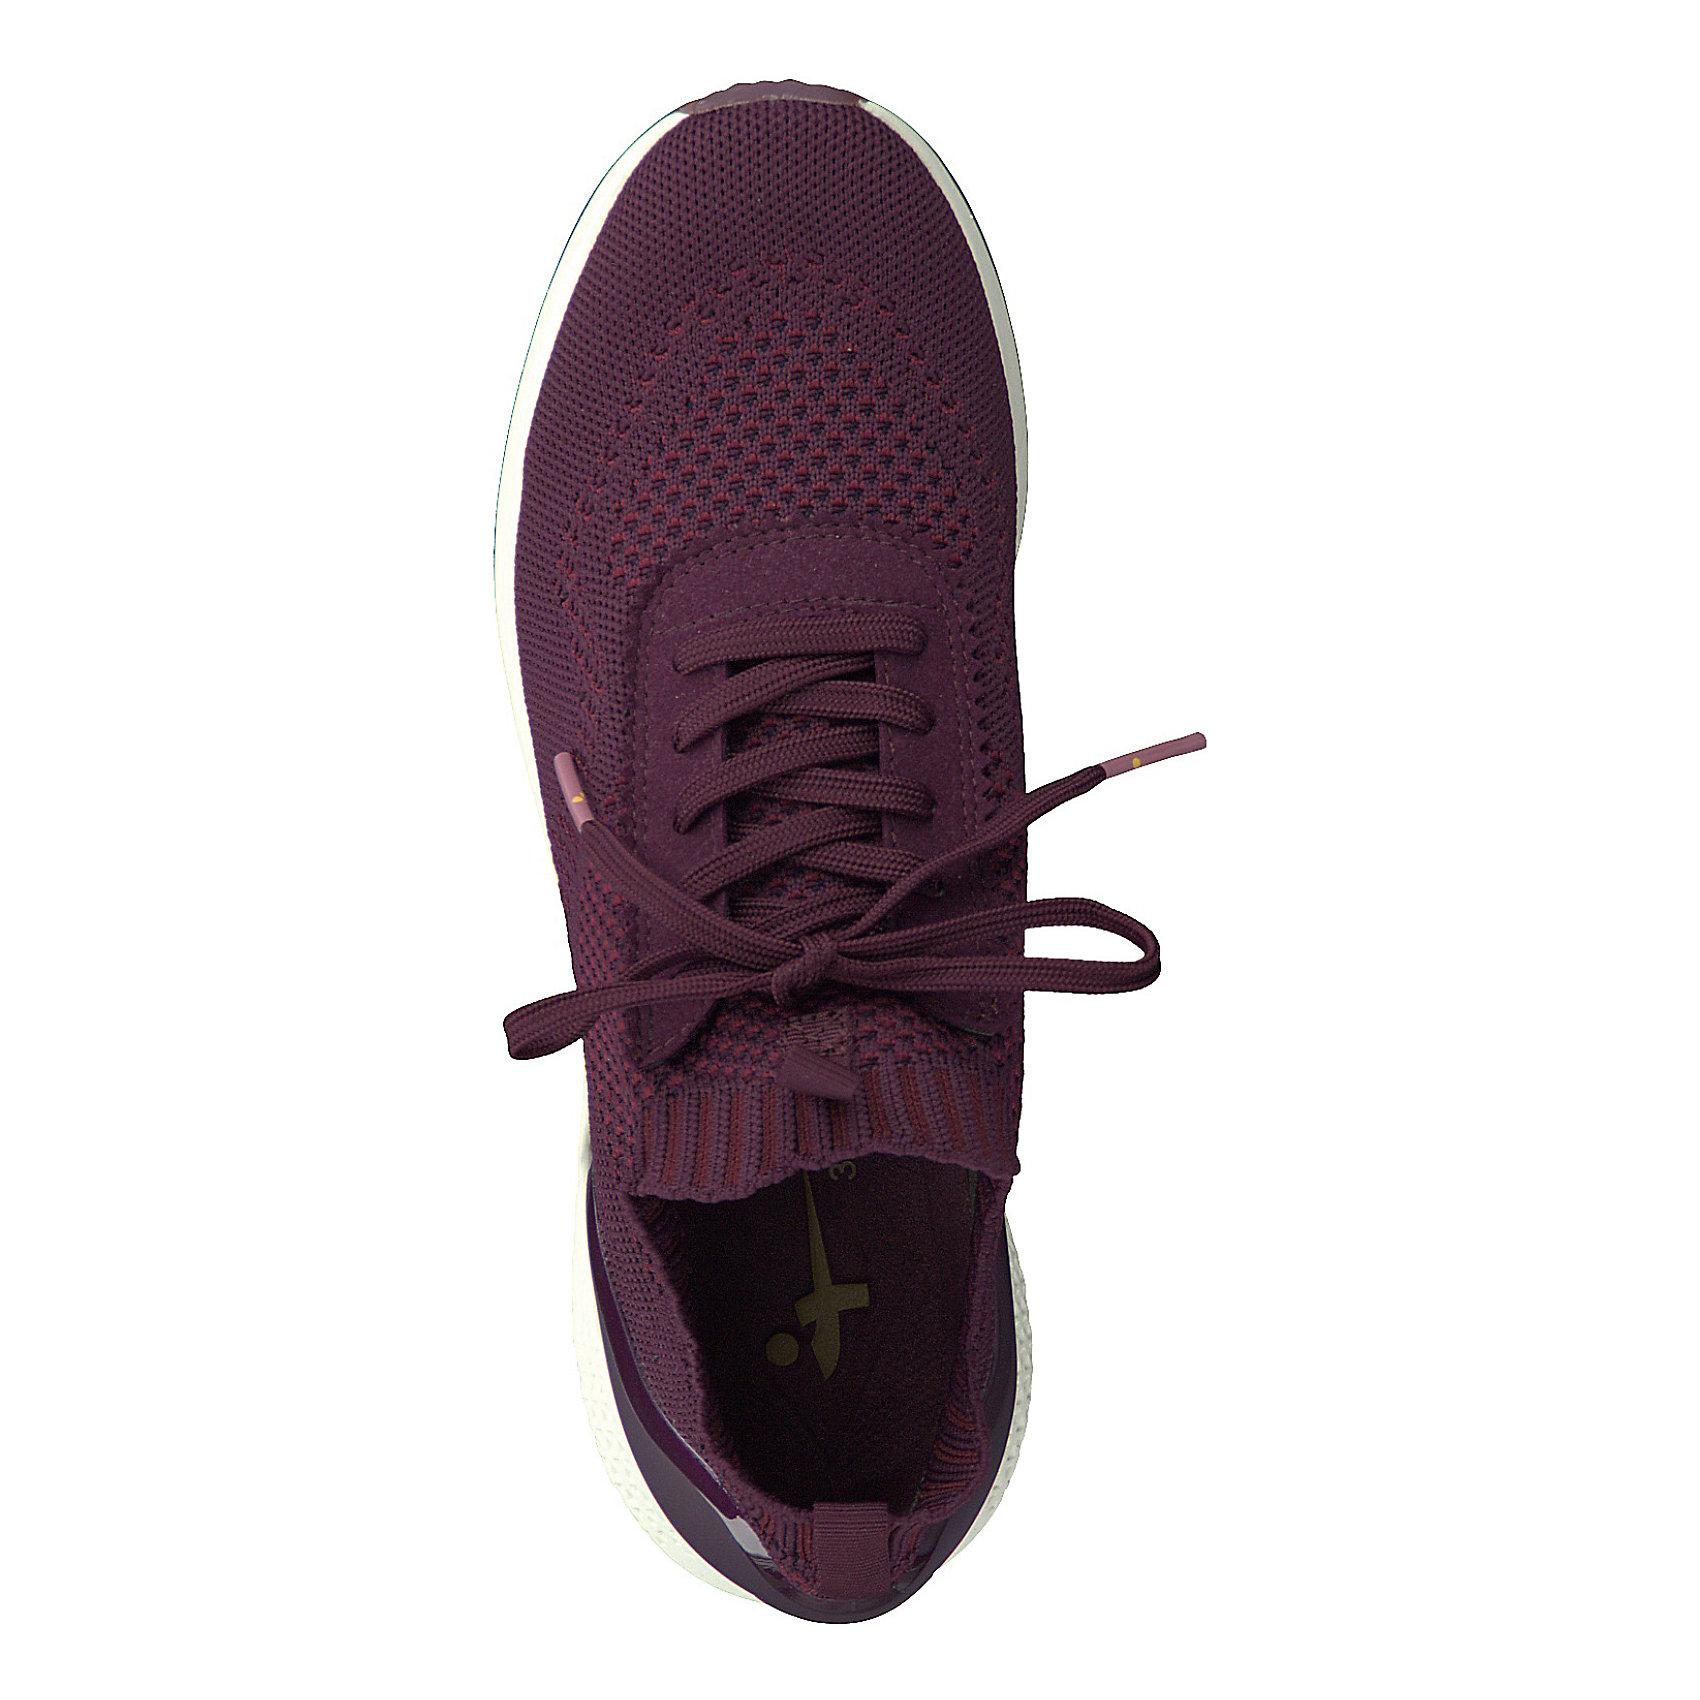 Neu Tamaris Sneakers Low 8819574 für Damen bordeaux